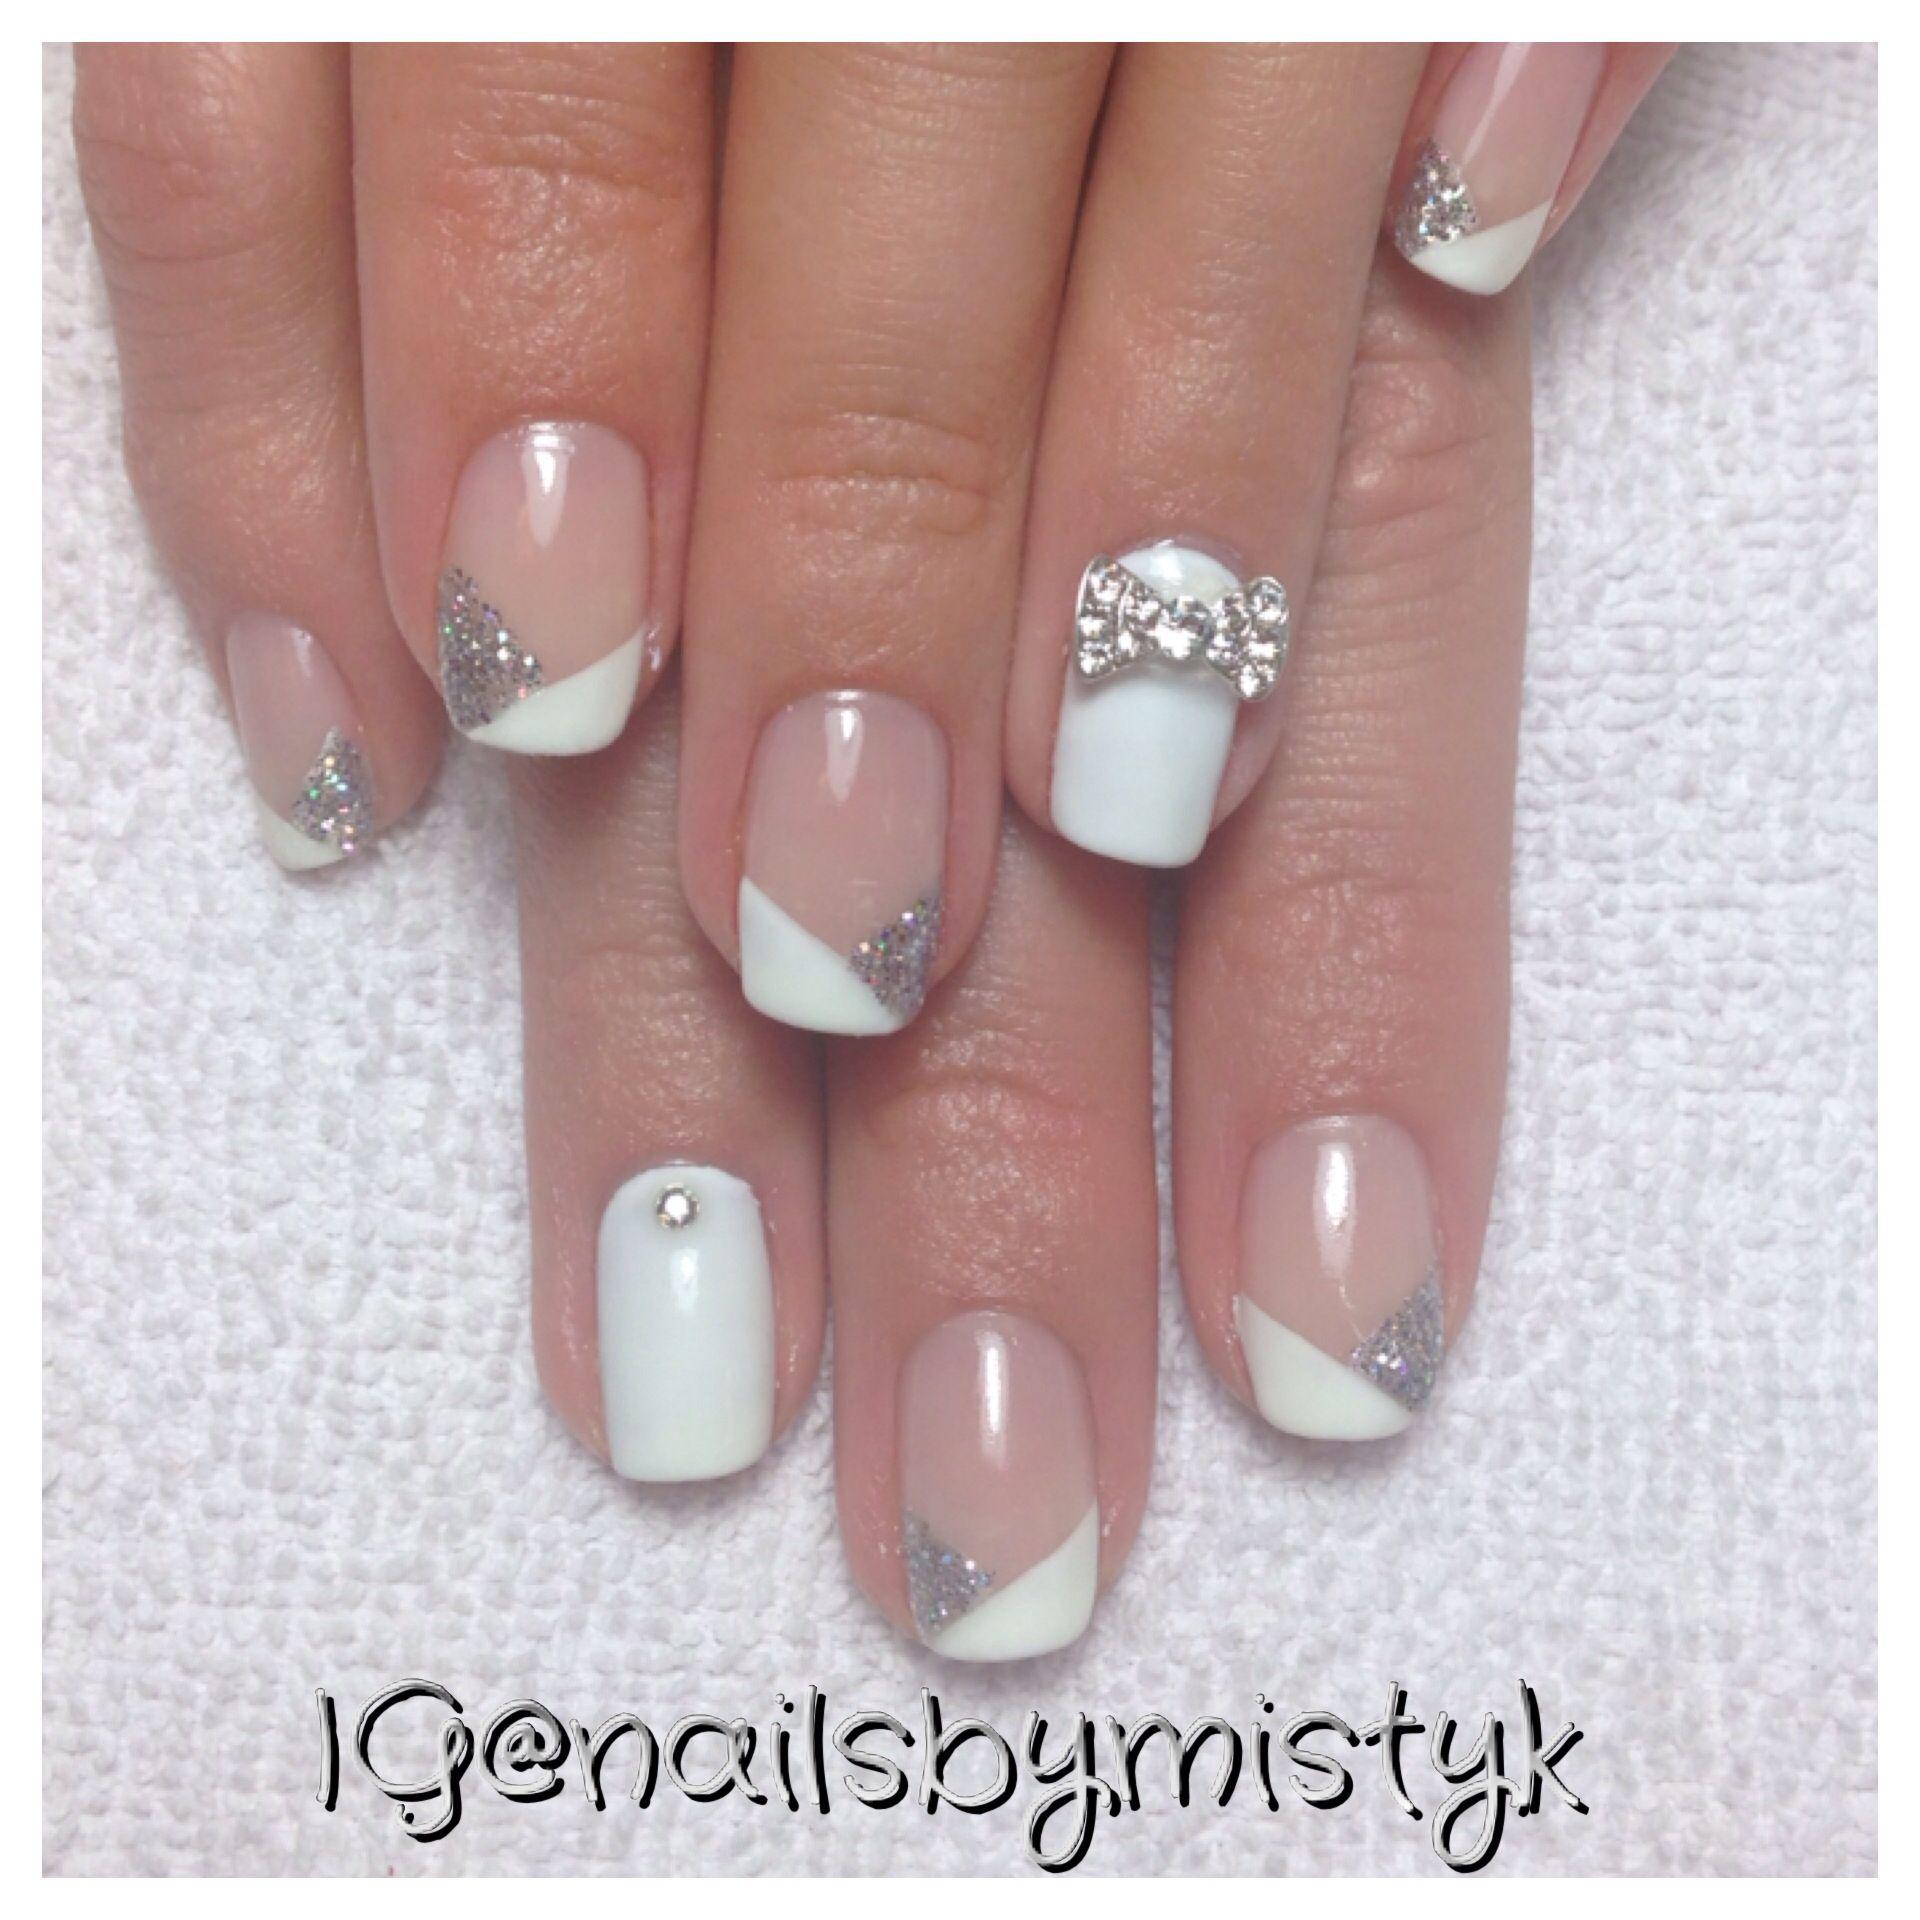 Cnd shellac nail art. 3d bow. Chevron French manicure   Nails ...